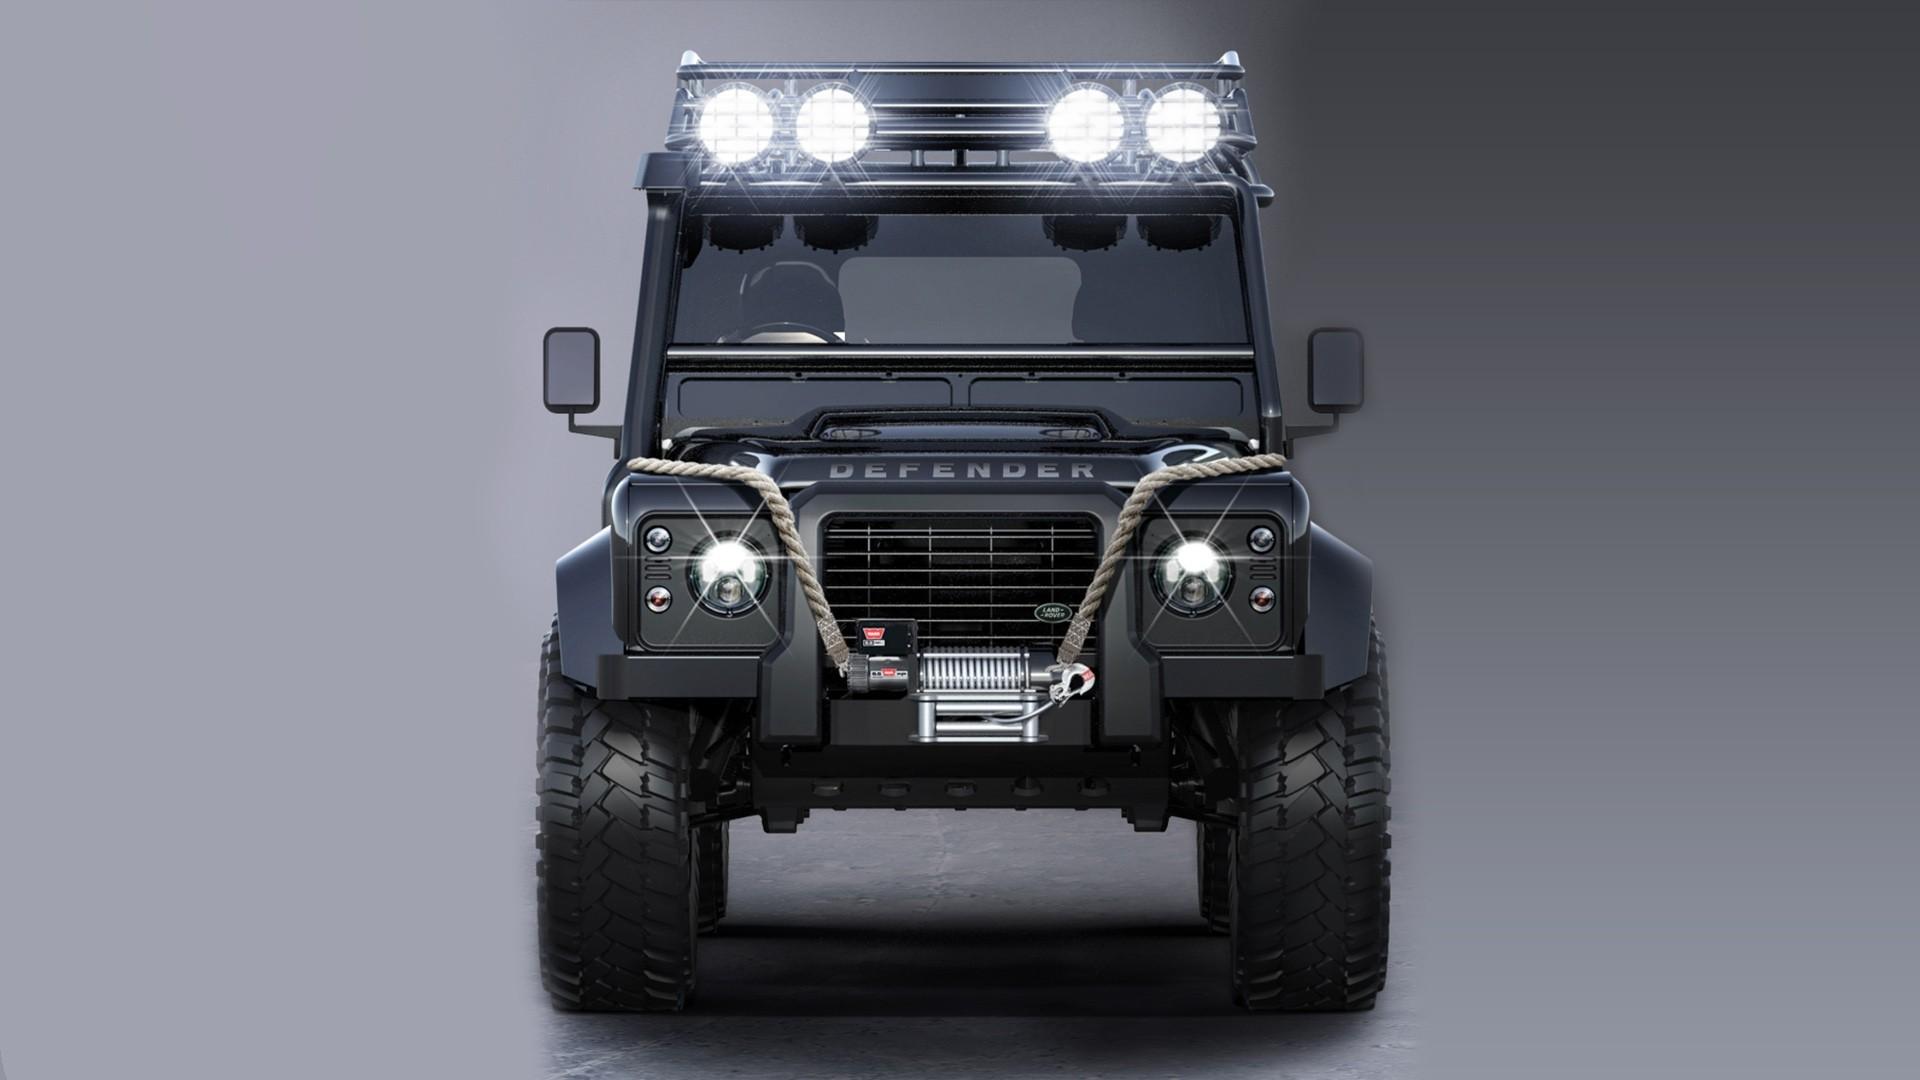 Res: 1920x1080, Land Rover Defender 2015 James Bond SPECTRE Villain Car Wallpaper